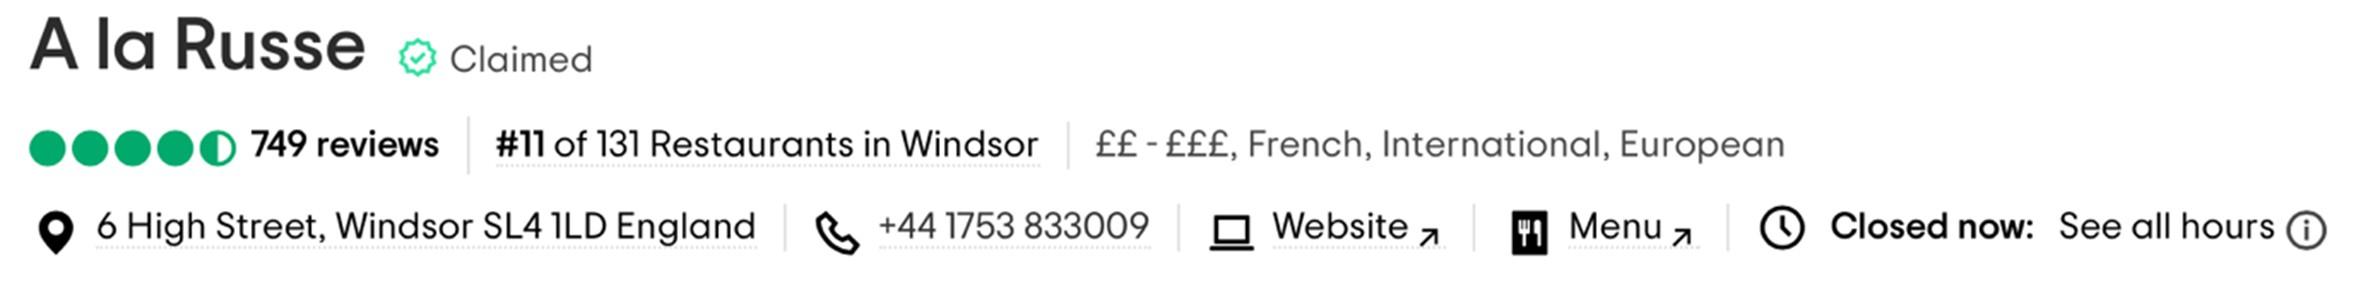 TripAdvisor listing screenshot